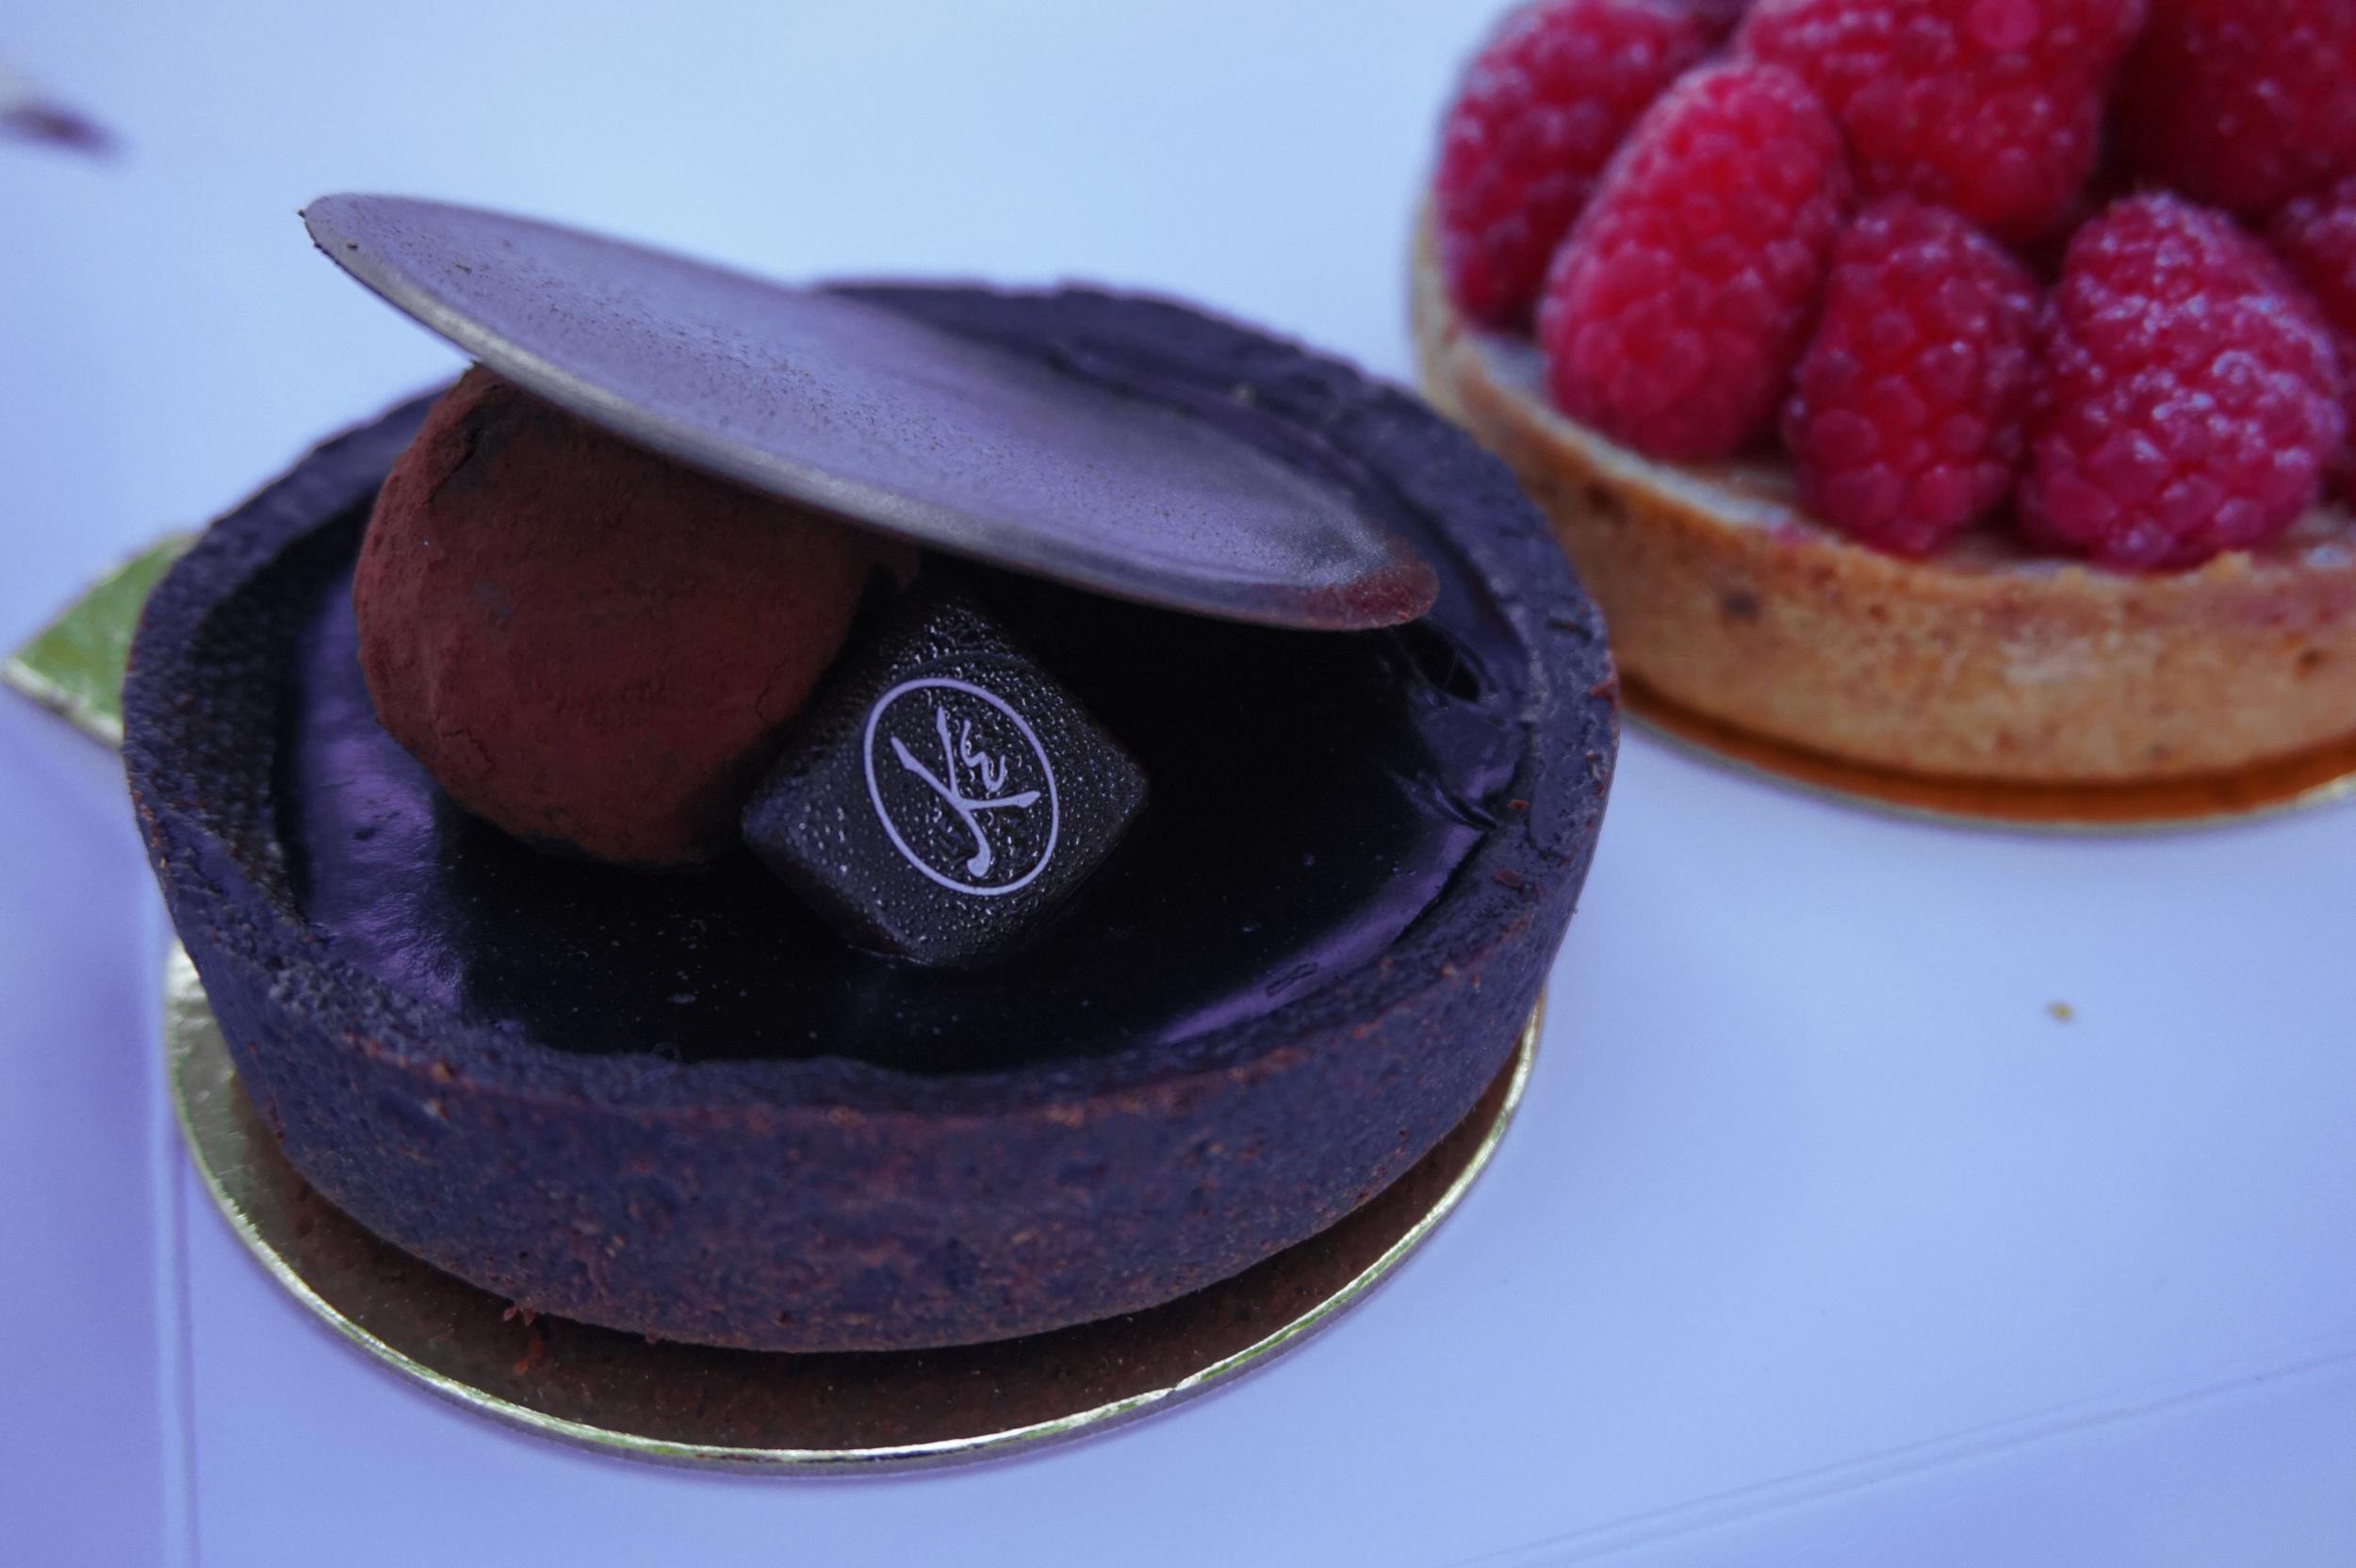 Dark chocolate tarte from Maison Kayser